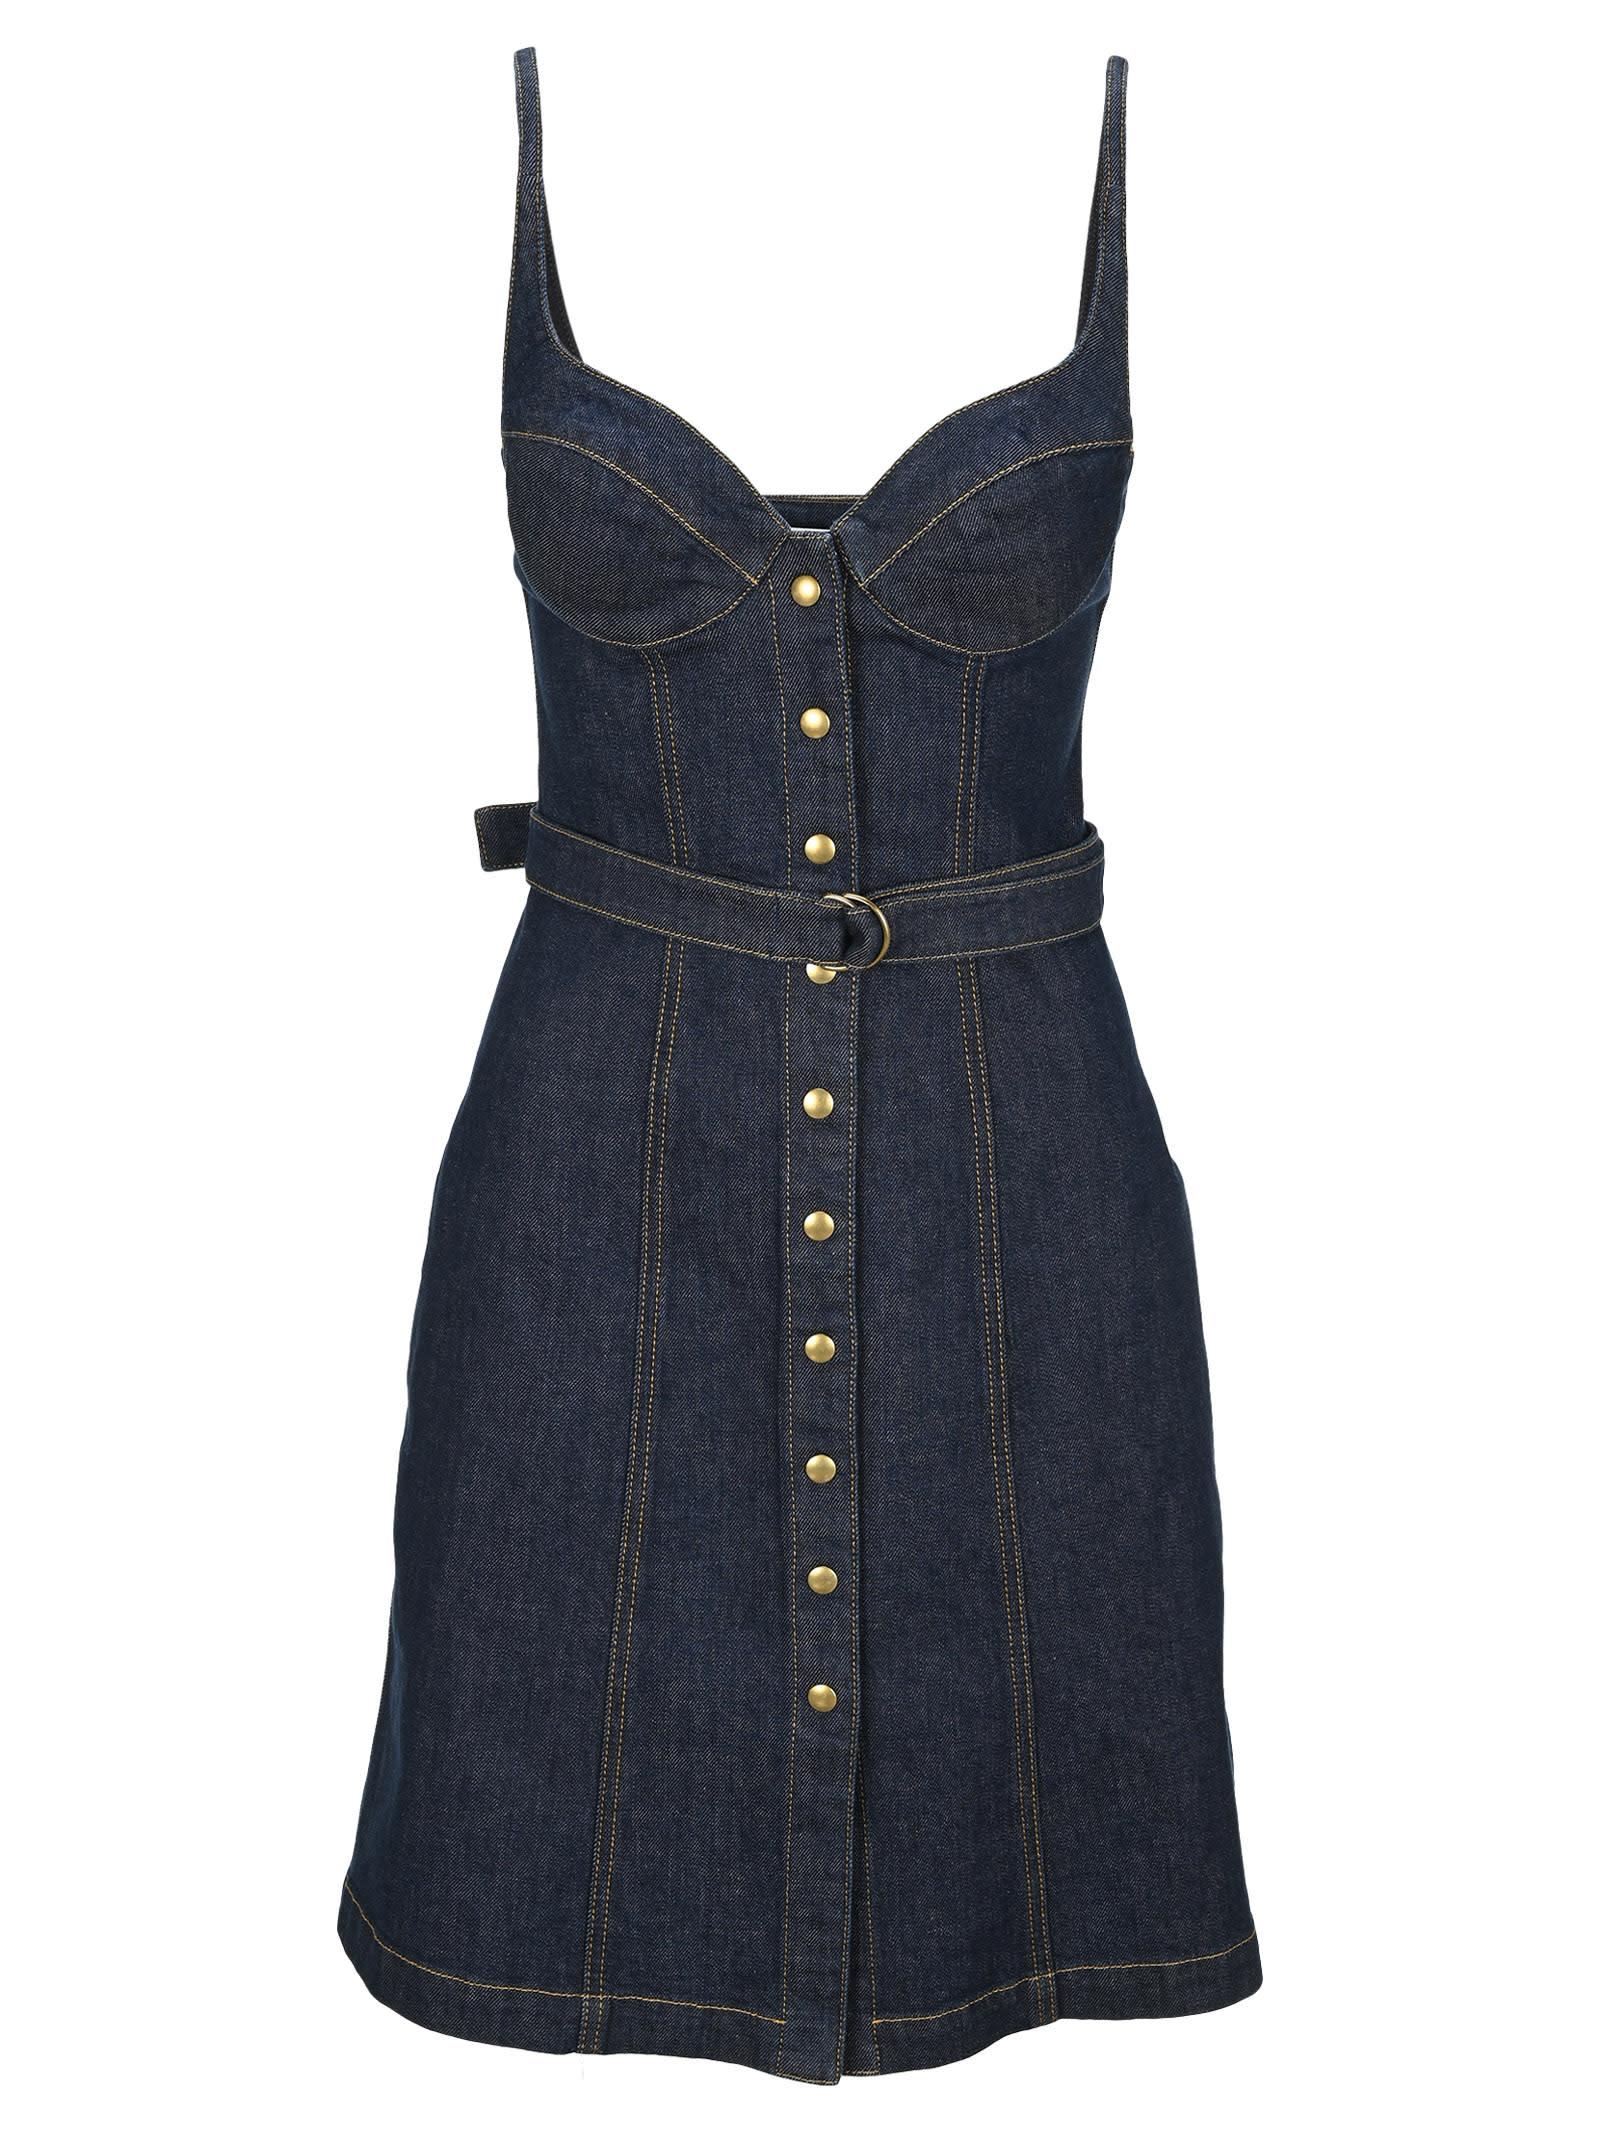 Buy Philosophy Corset Denim Dress online, shop Philosophy di Lorenzo Serafini with free shipping